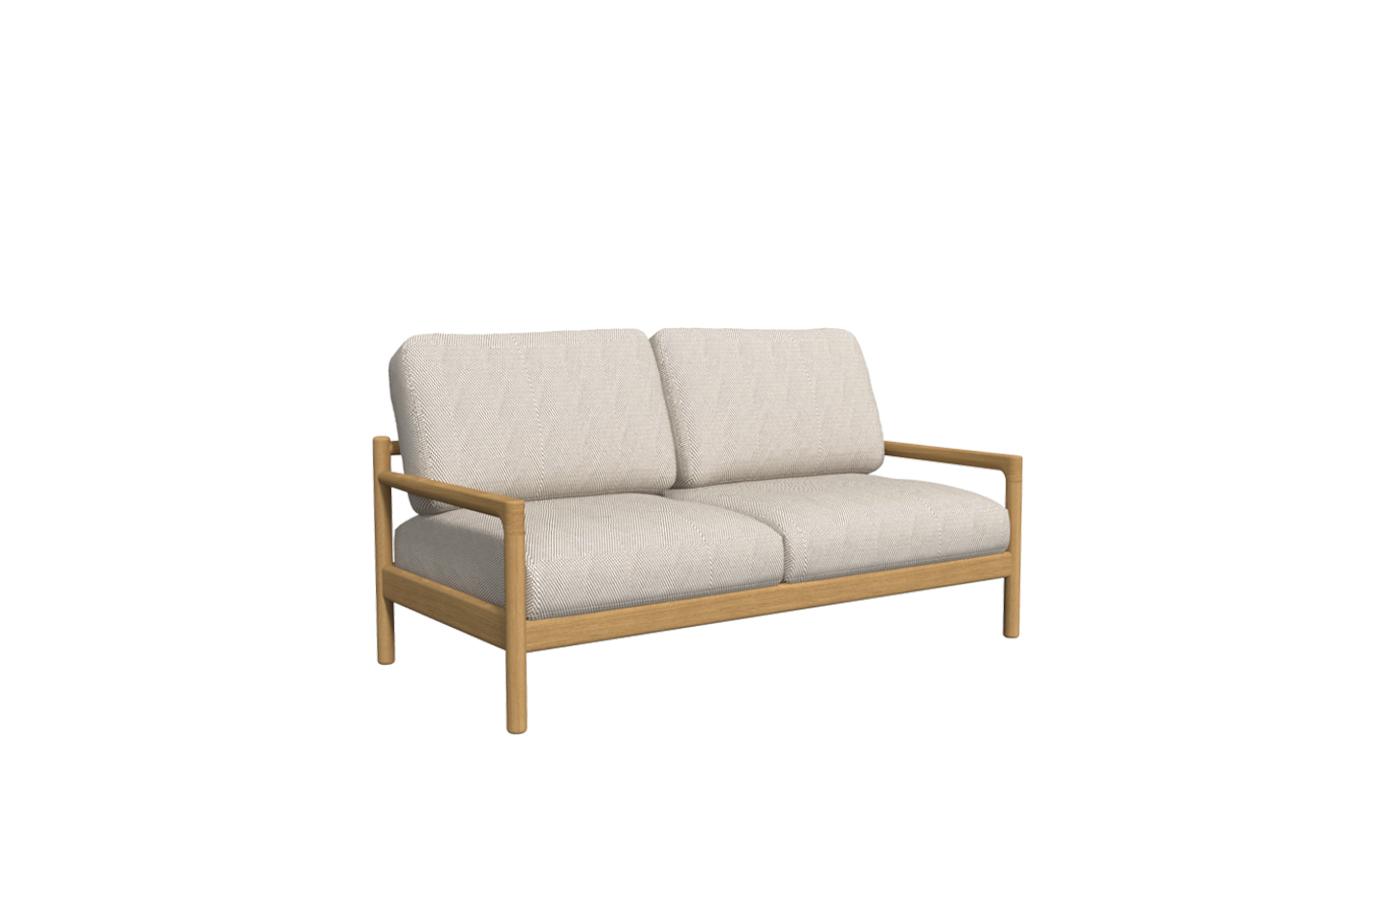 Comforteak 2-Seater Sofa